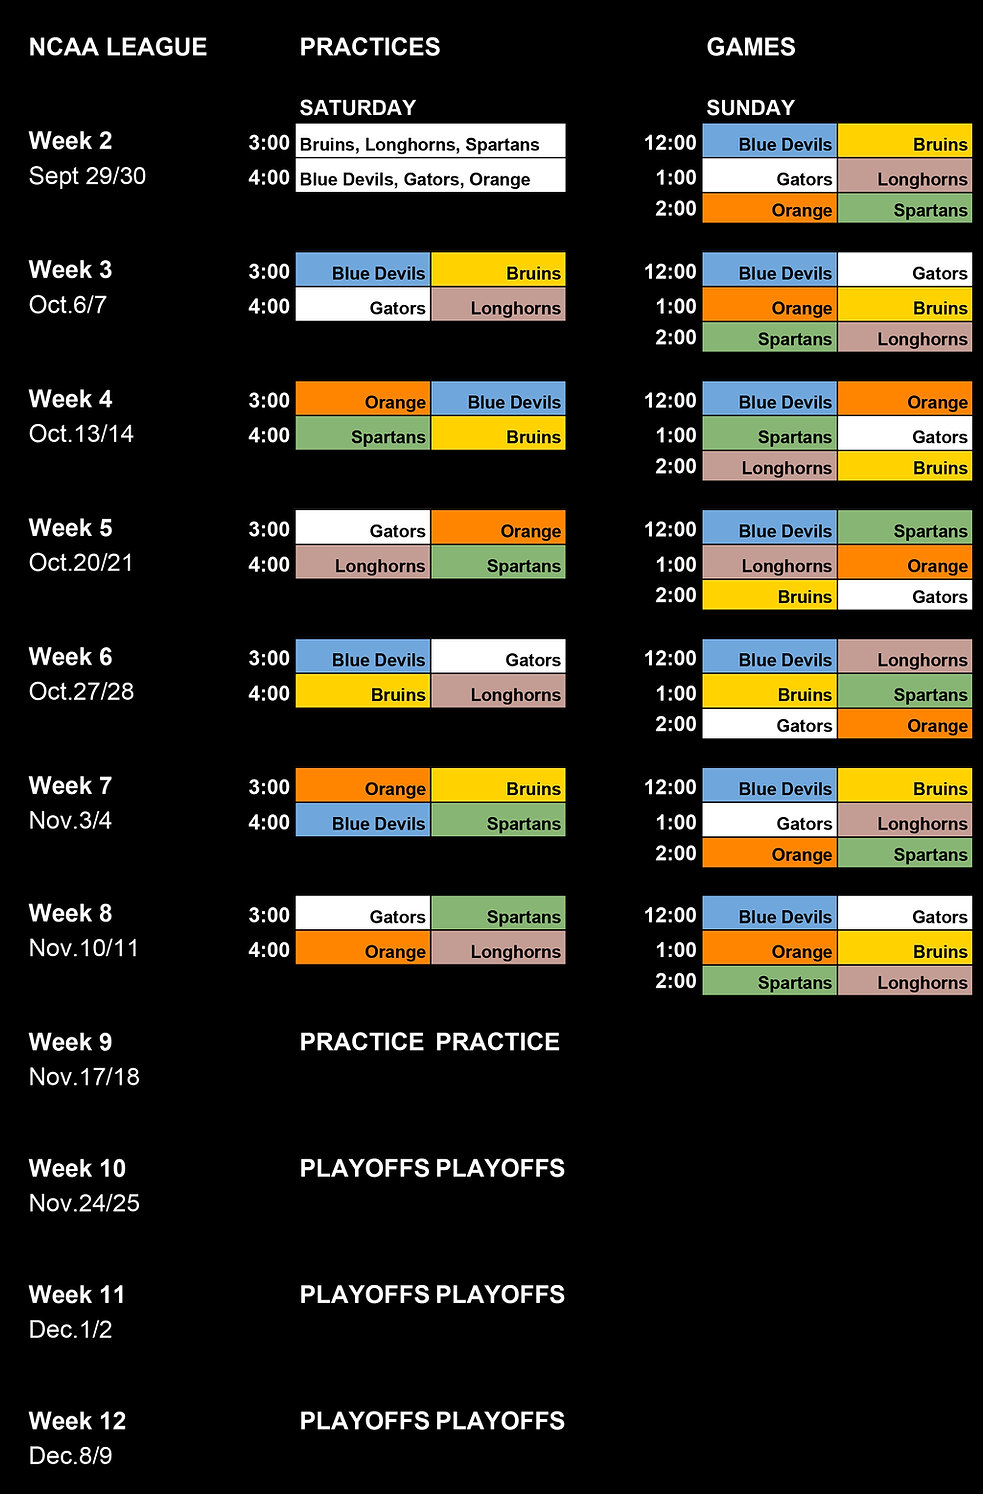 NCAA ScheduleJPG.jpg